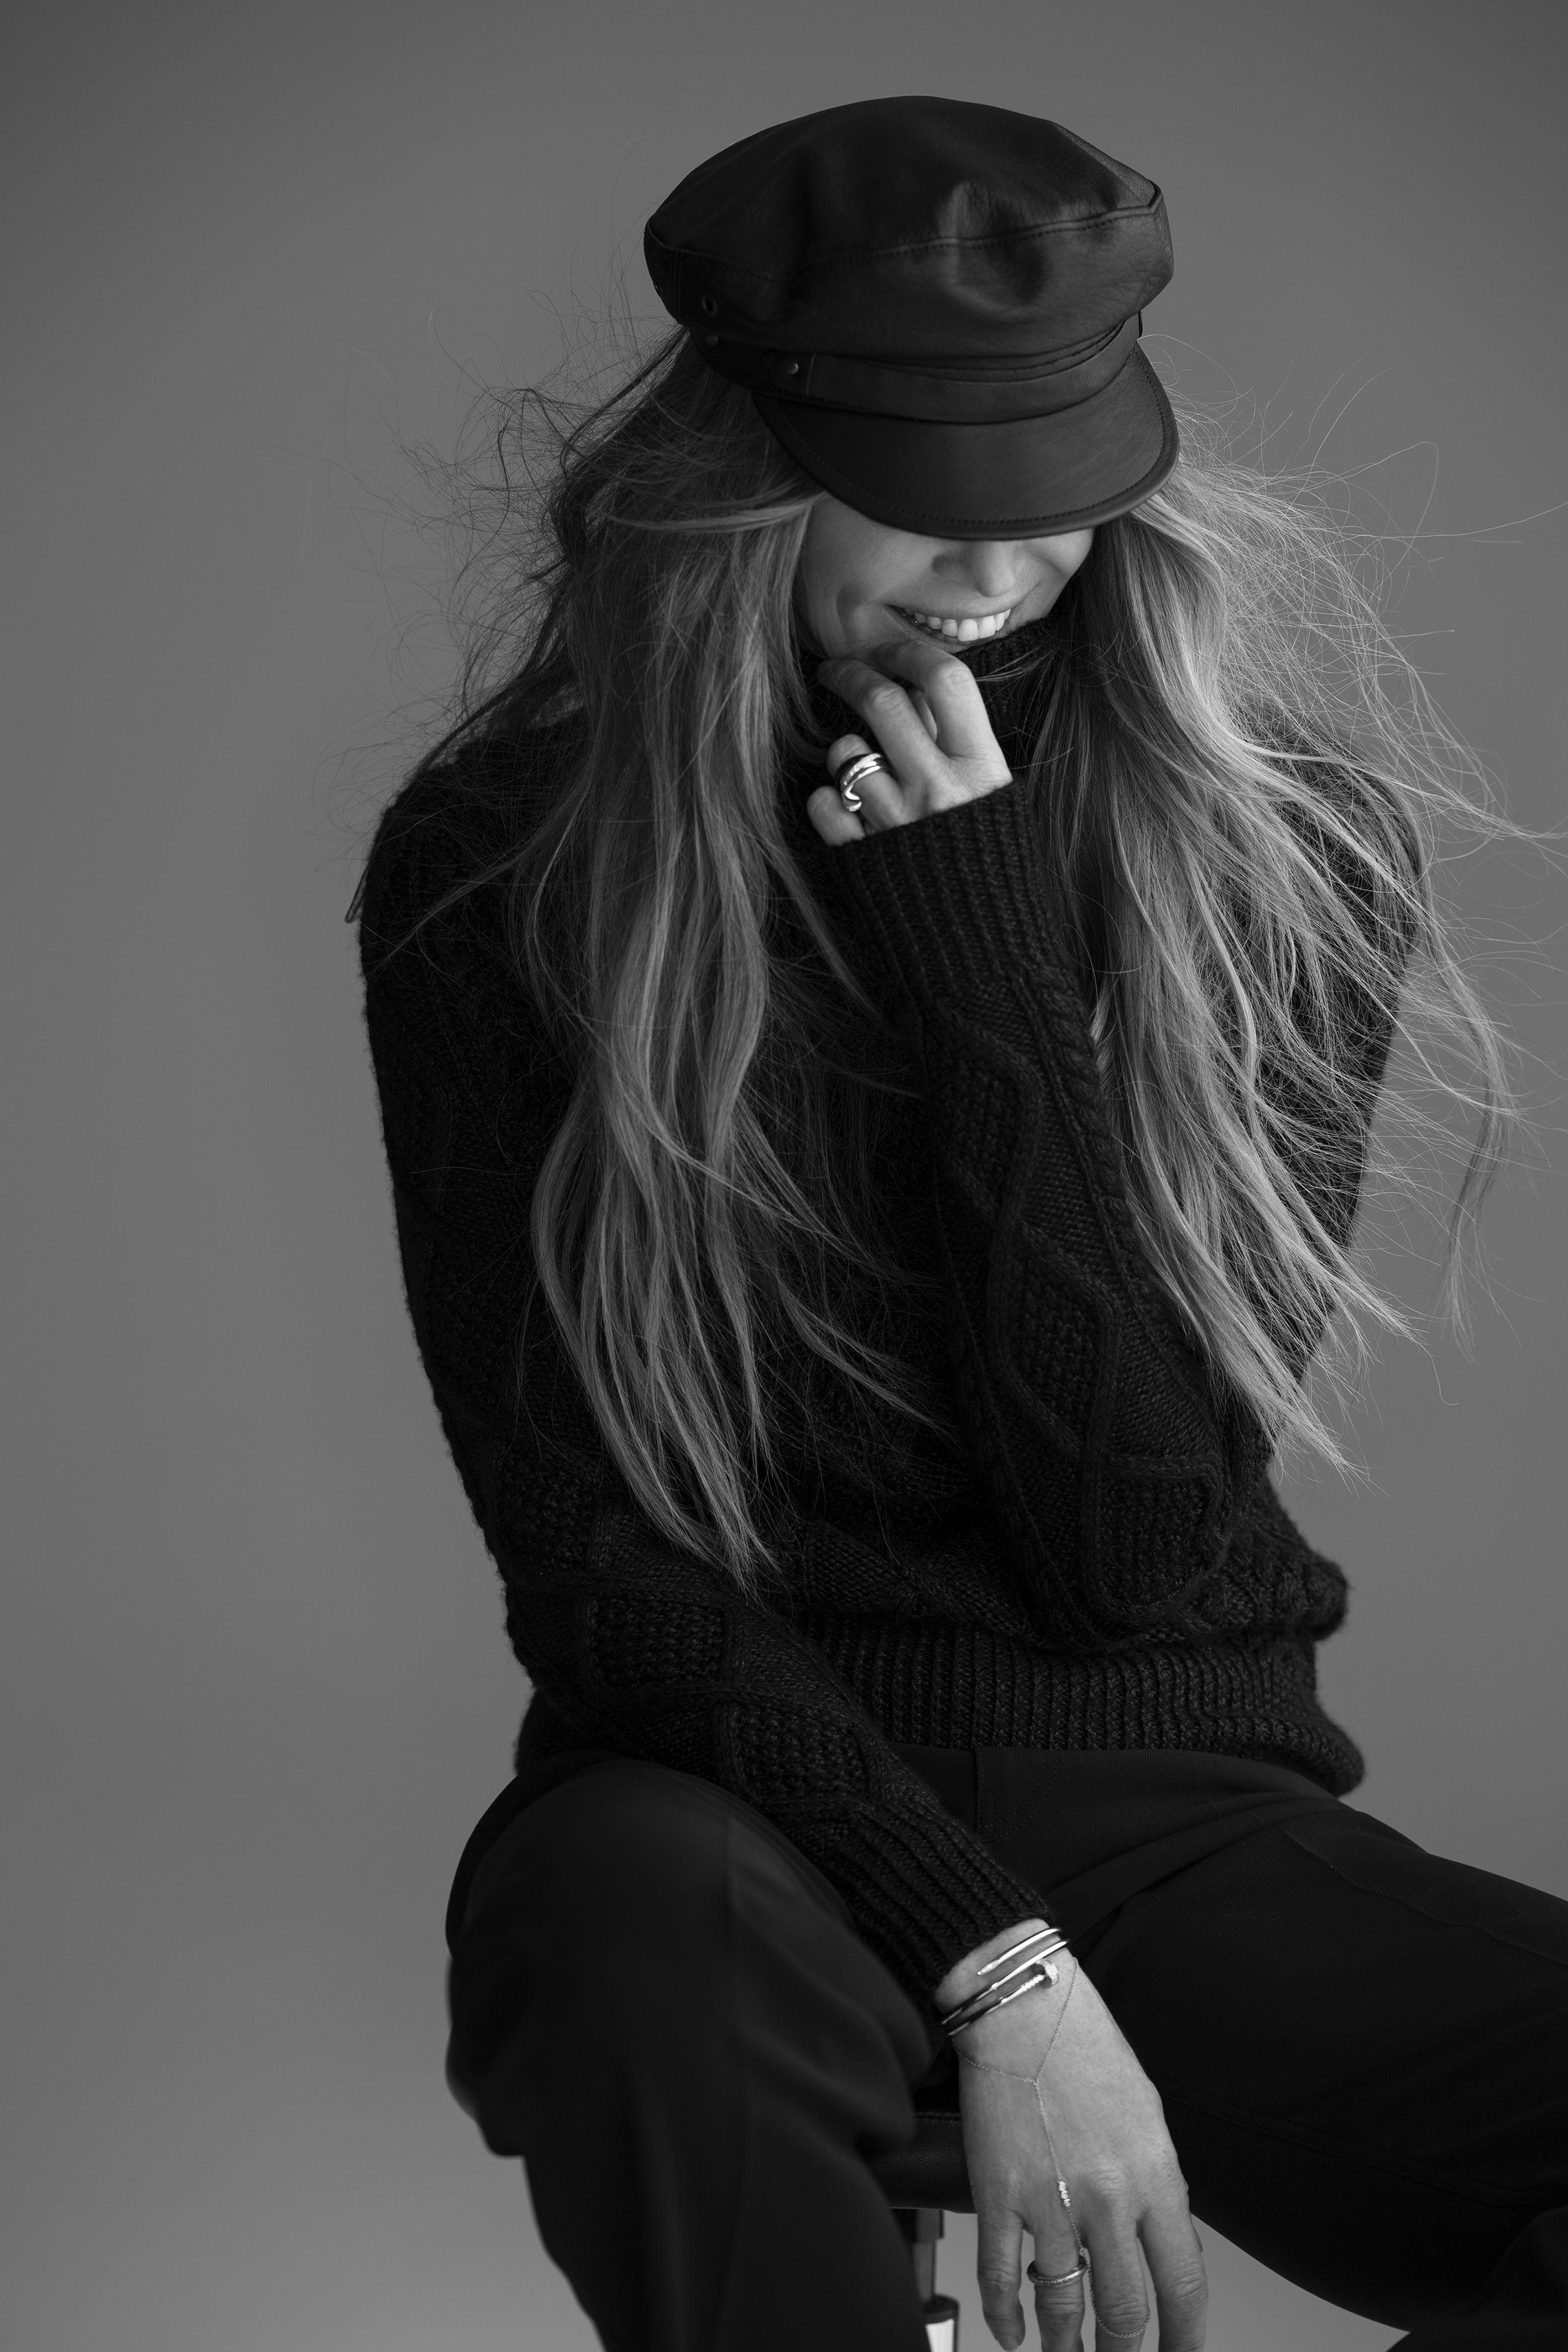 elle-macpherson-moda-2019-ralph-lauren-collection